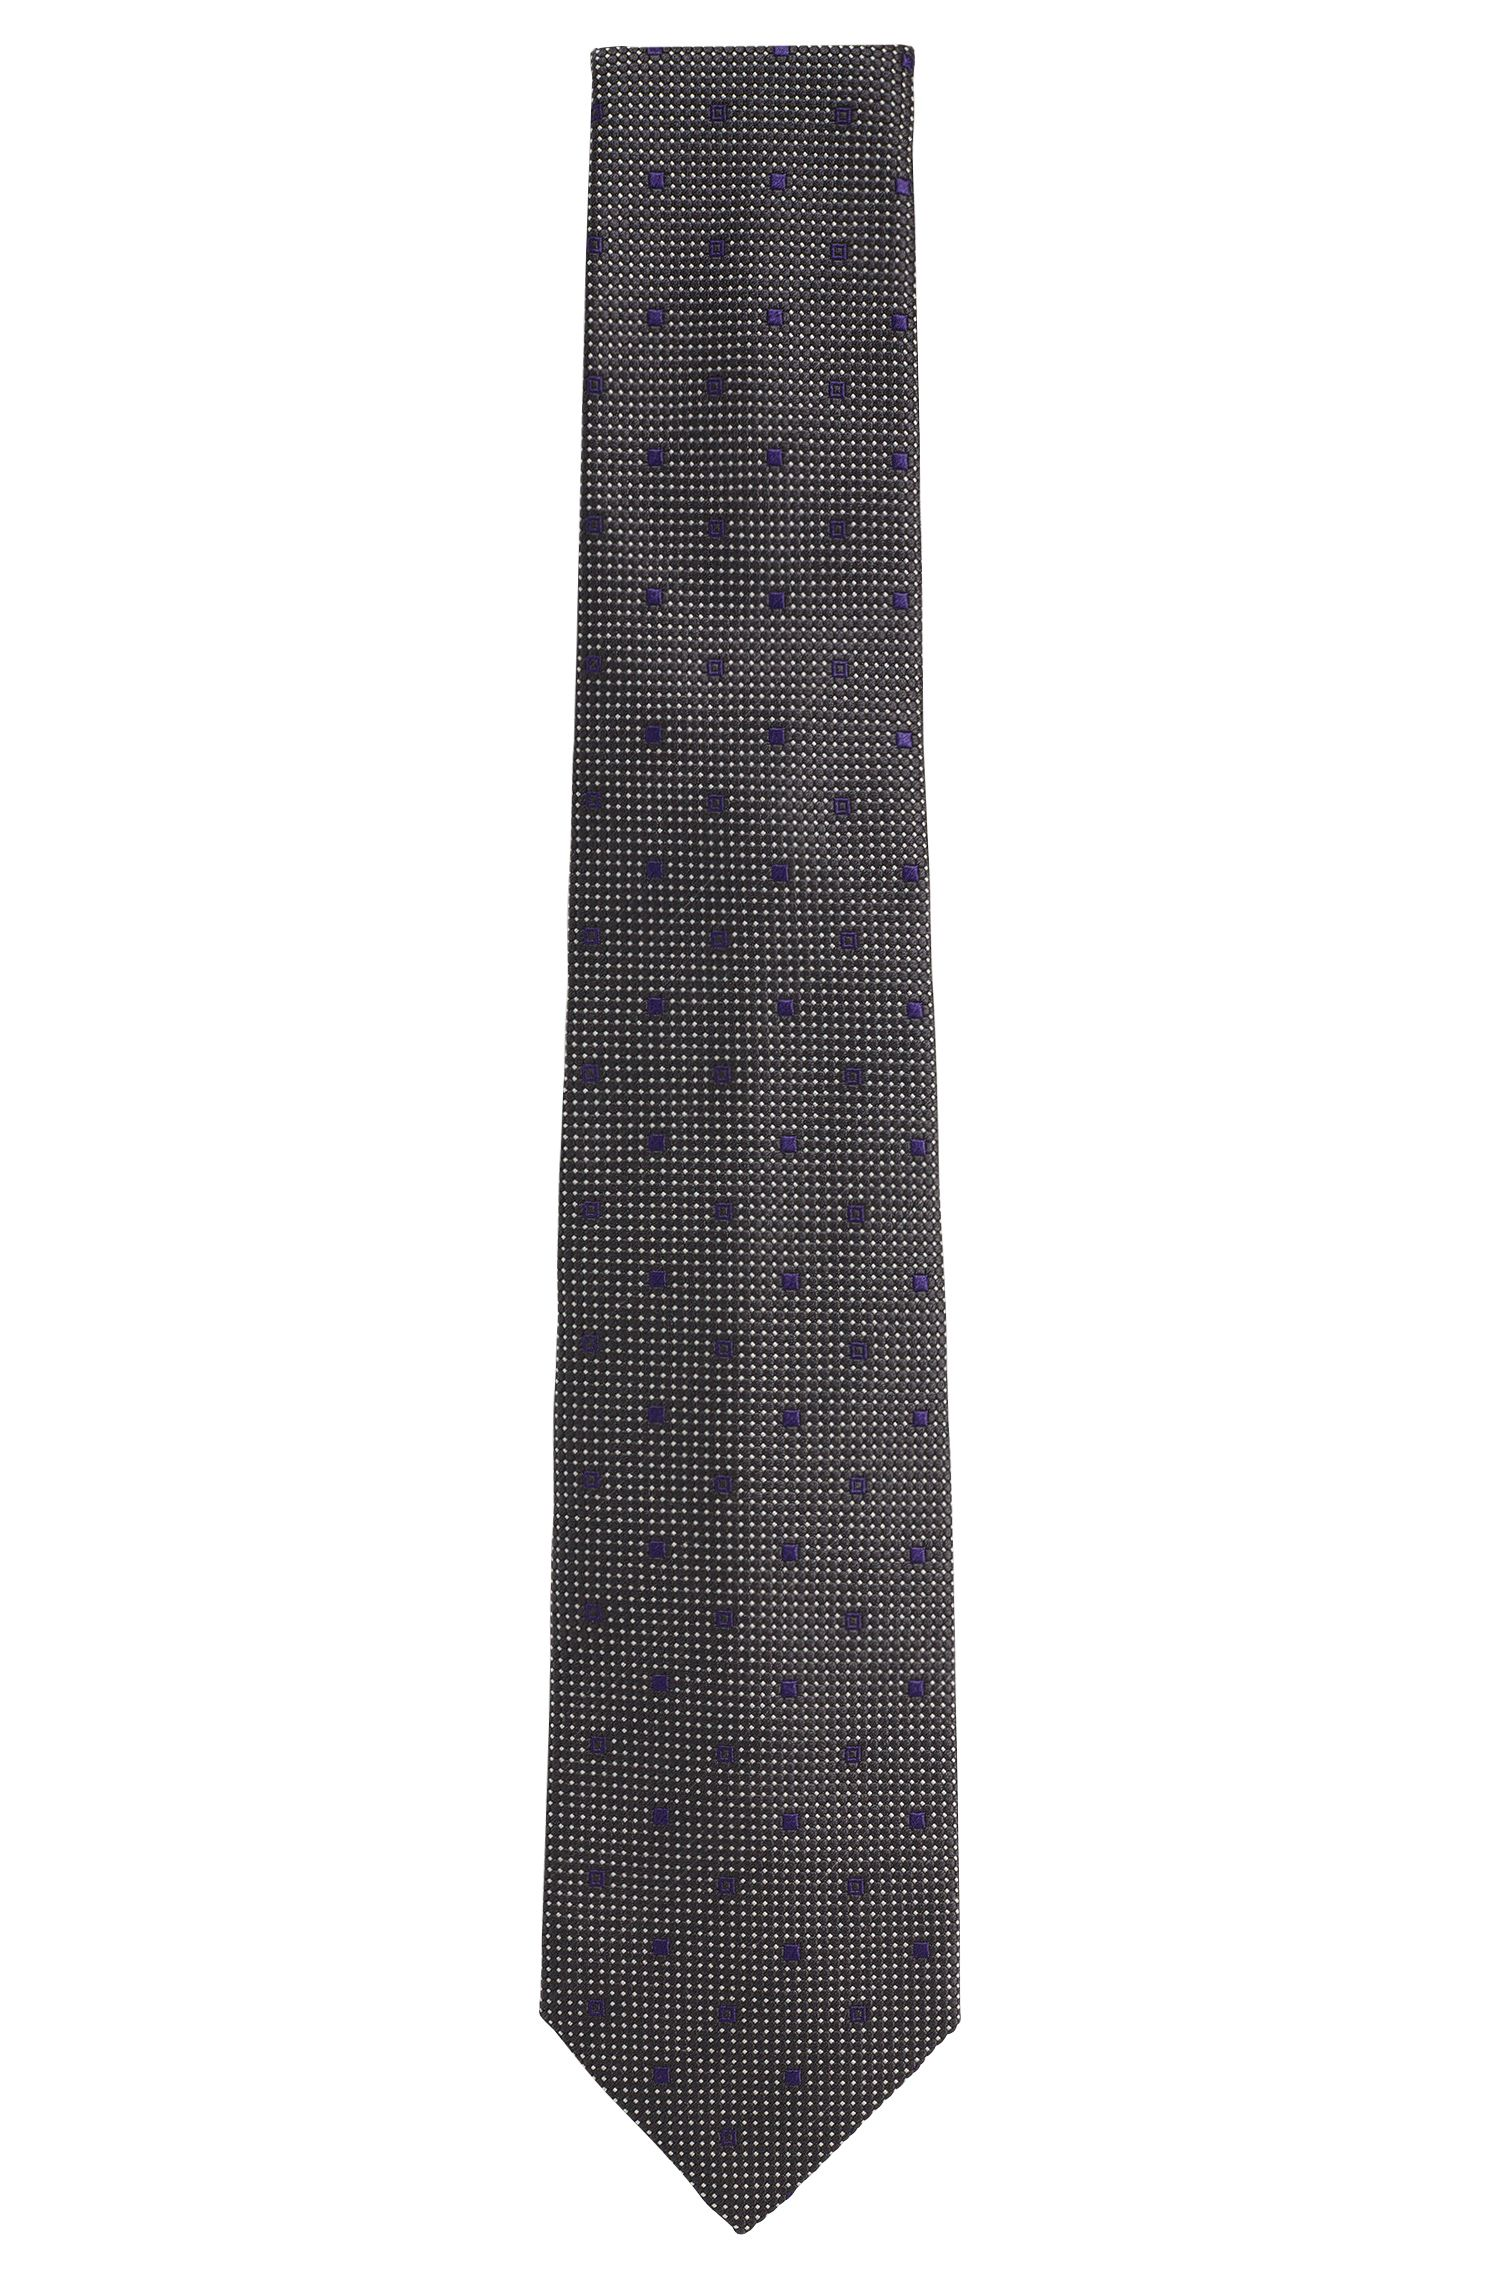 'T-Tie 7.5 cm'   Regular, Italian Silk Patterned Tie